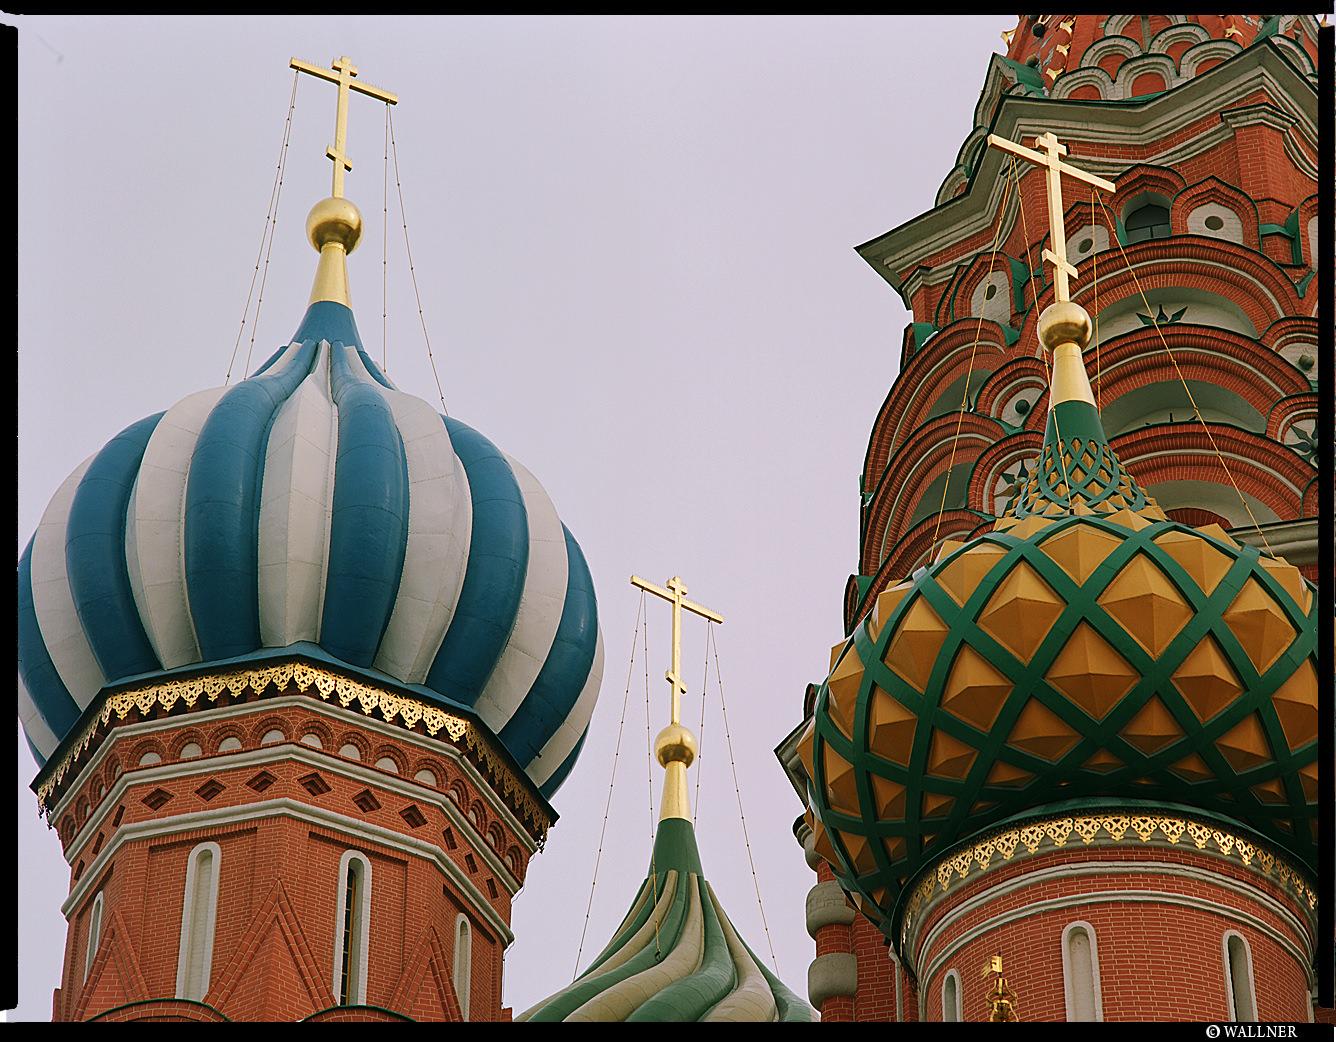 MediumFormatPatrikWallner_Moscow_RedCloseUpLOWQ